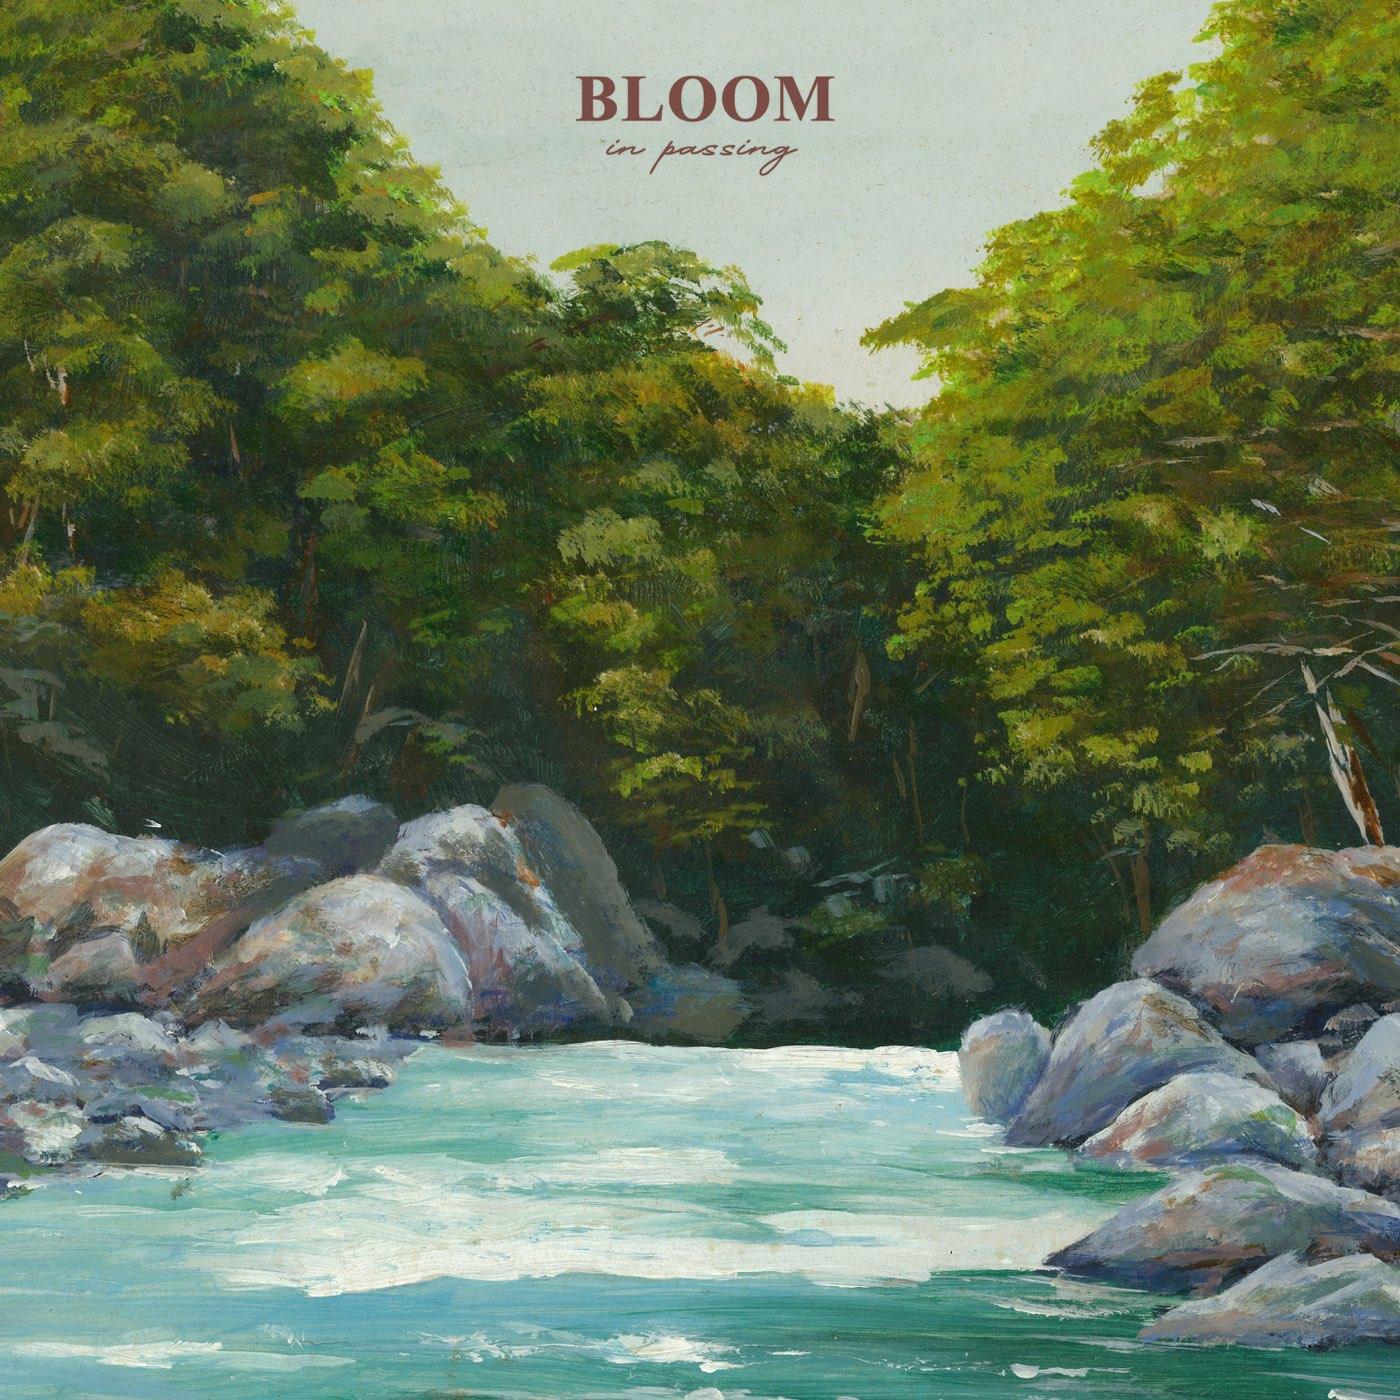 Bloom - In Passing [EP] (2020)